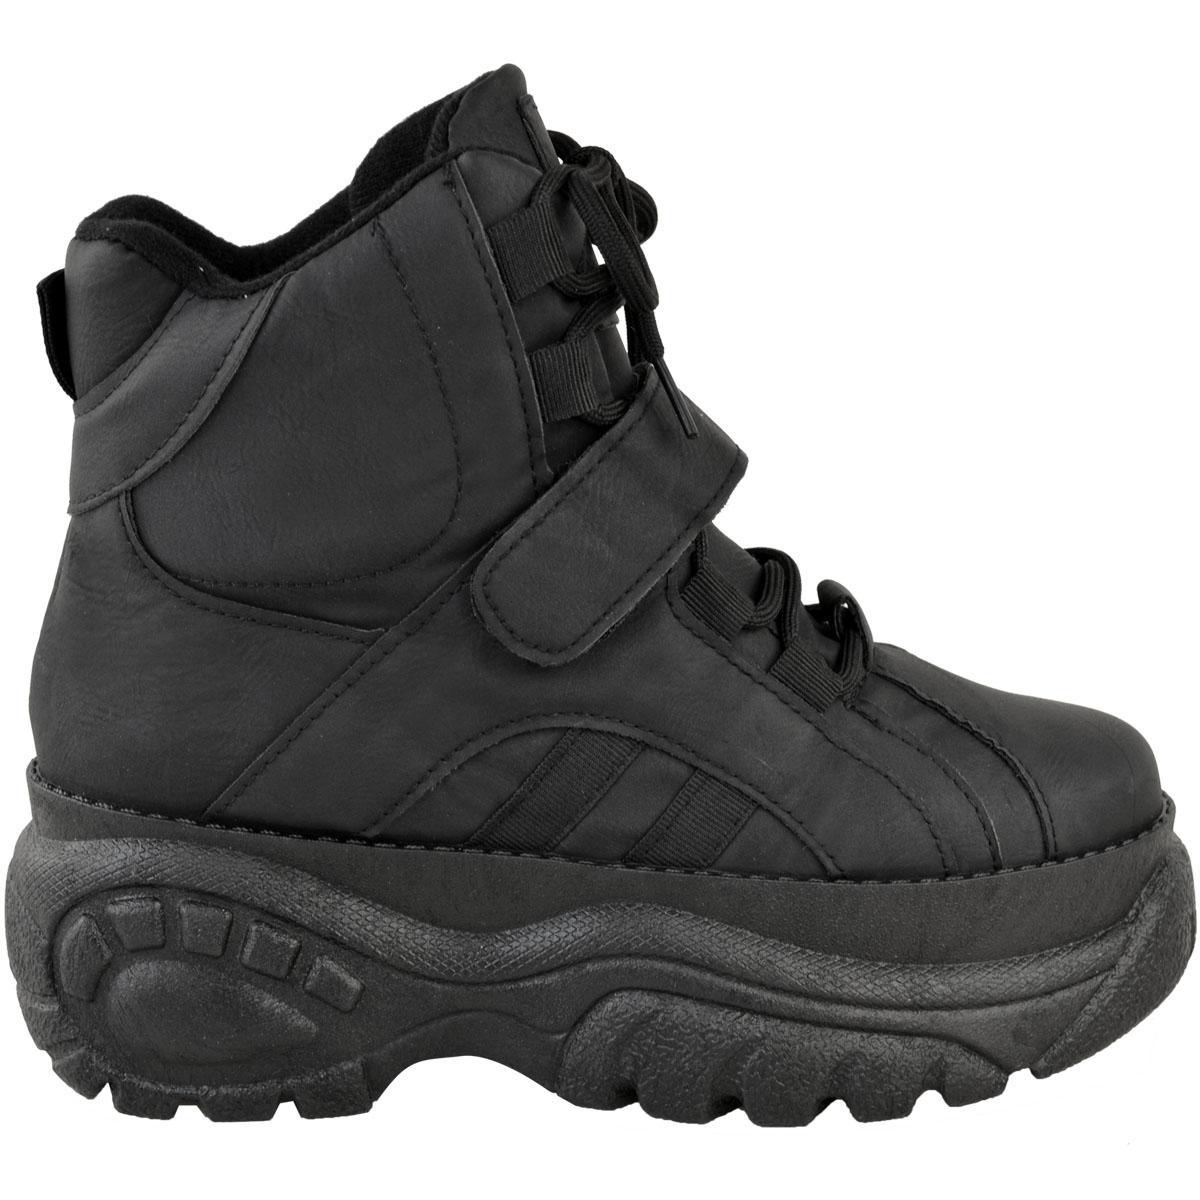 Womens-Ladies-High-Platform-Trainers-Sneakers-Retro-Boots-Hi-Top-Wedge-Punk-Goth thumbnail 4